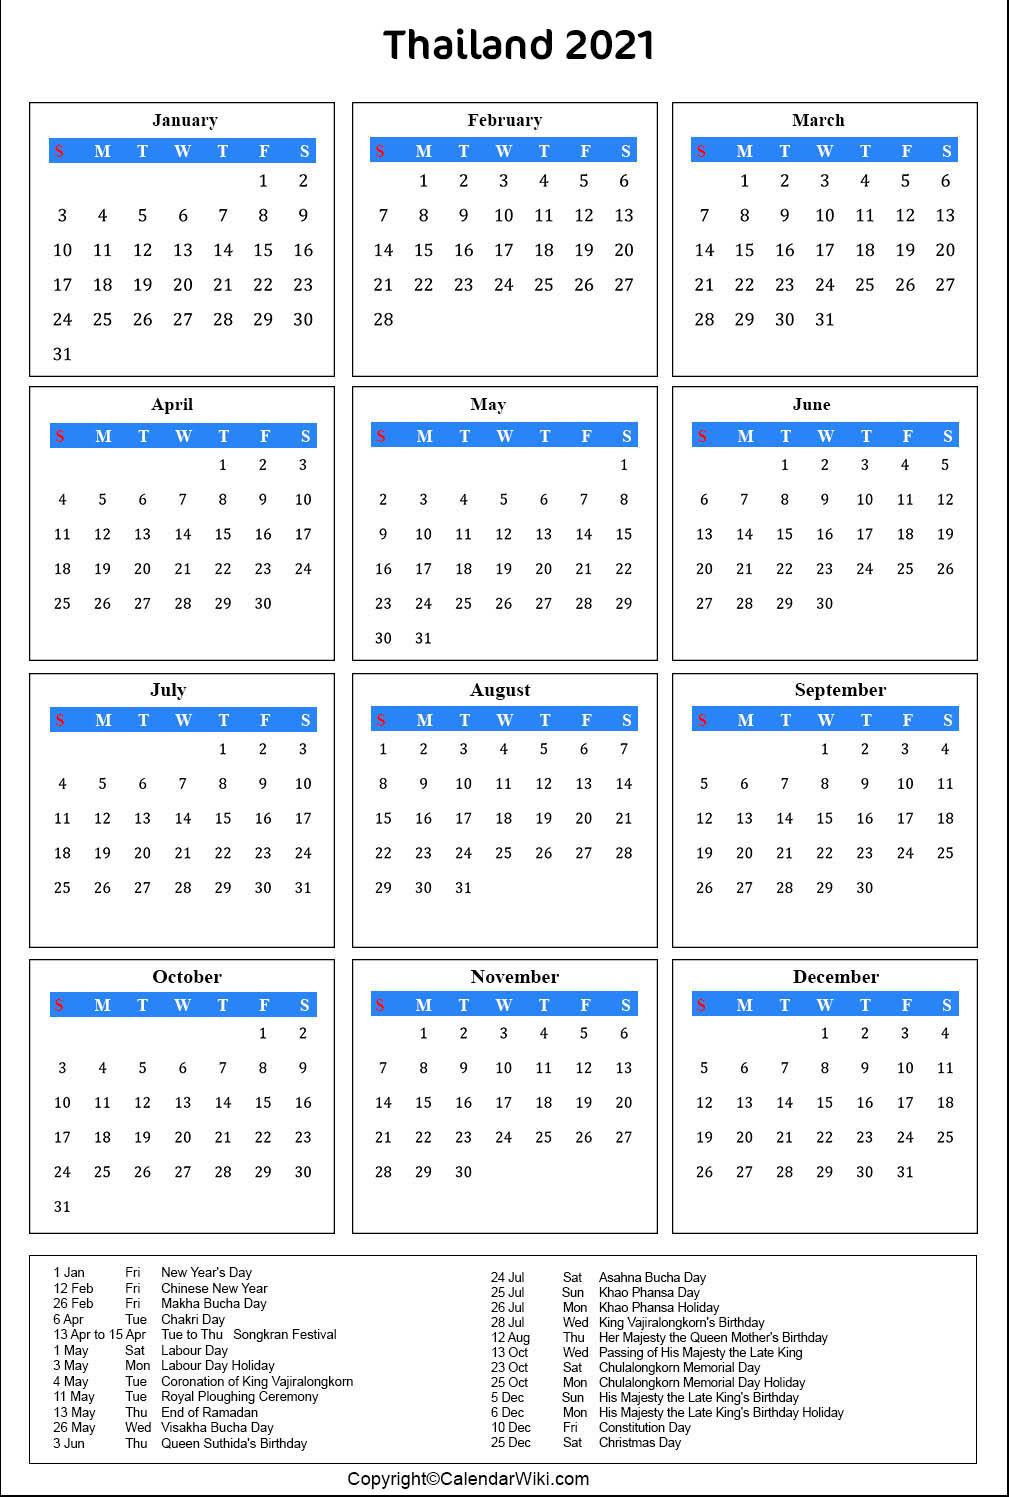 Printable Thailand Calendar 2021 With Holidays [Public-Printable List Of 2021 National Days